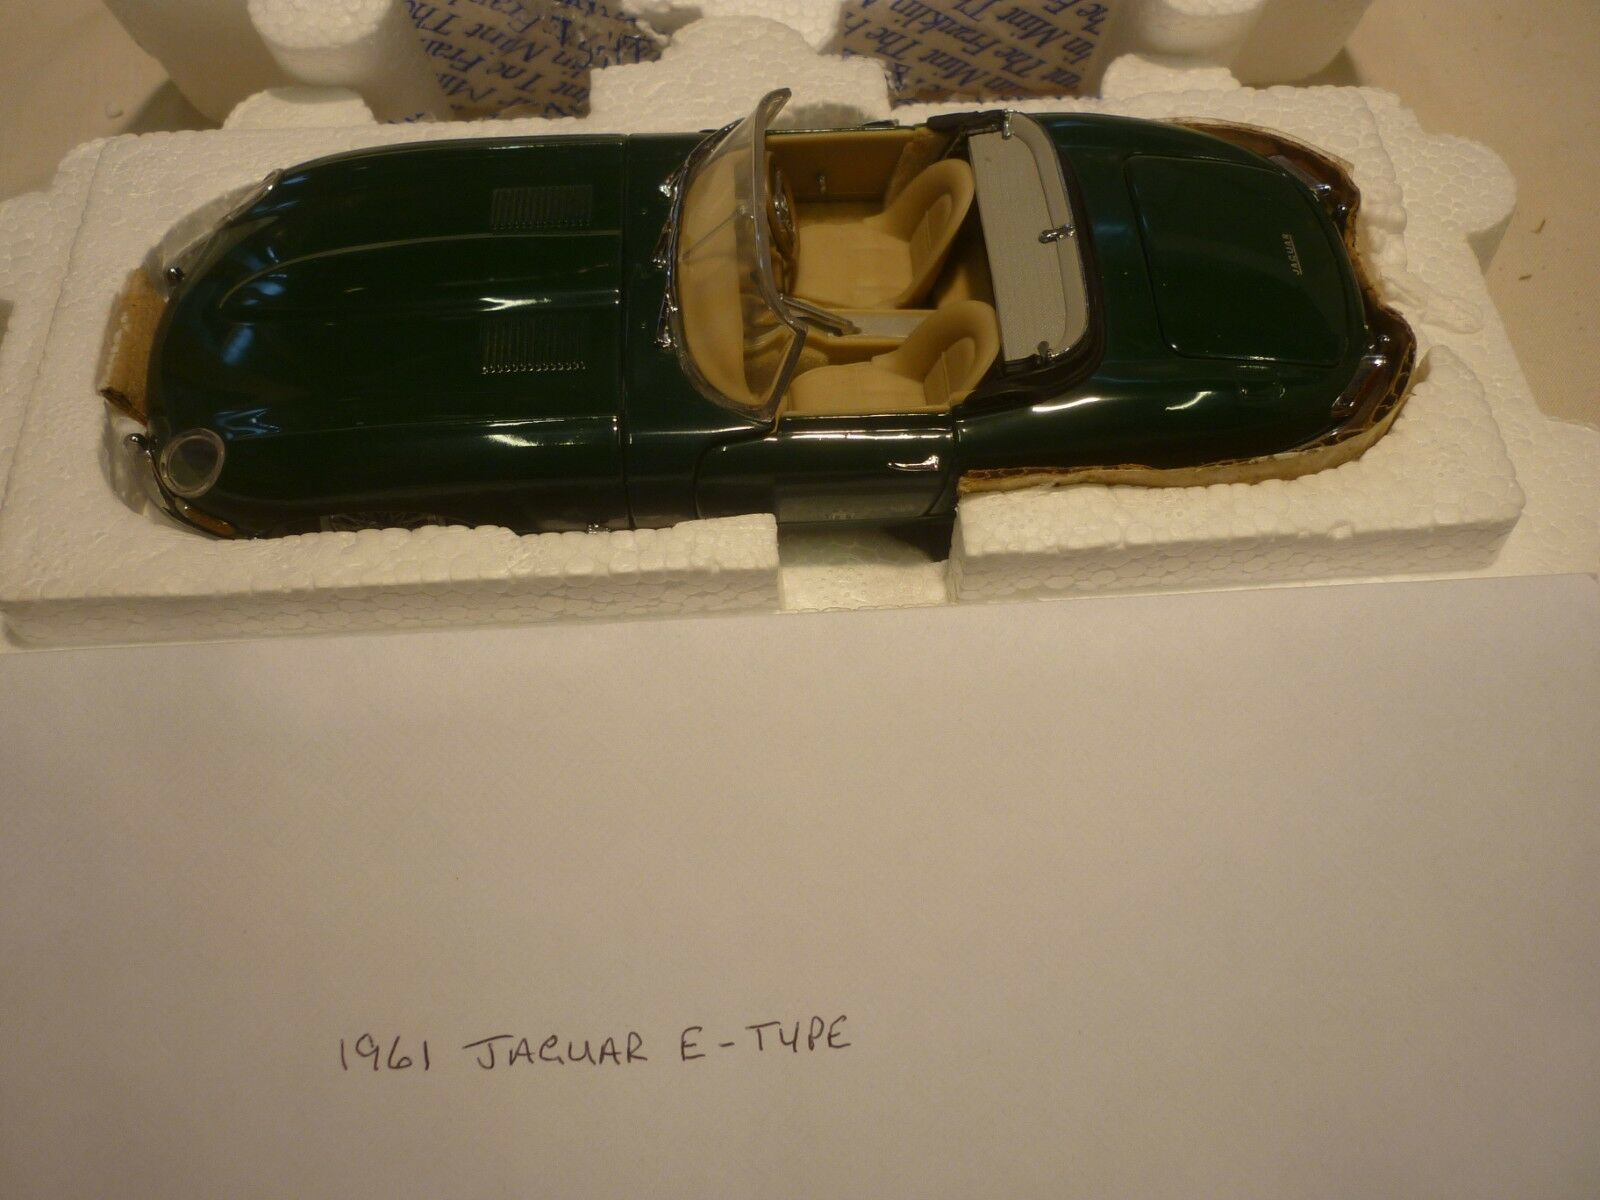 diseños exclusivos Un modelo de escala Franklin Mint de un 1961 JAGUAR JAGUAR JAGUAR XKE Roadster, En Caja, Papeles  nuevo listado